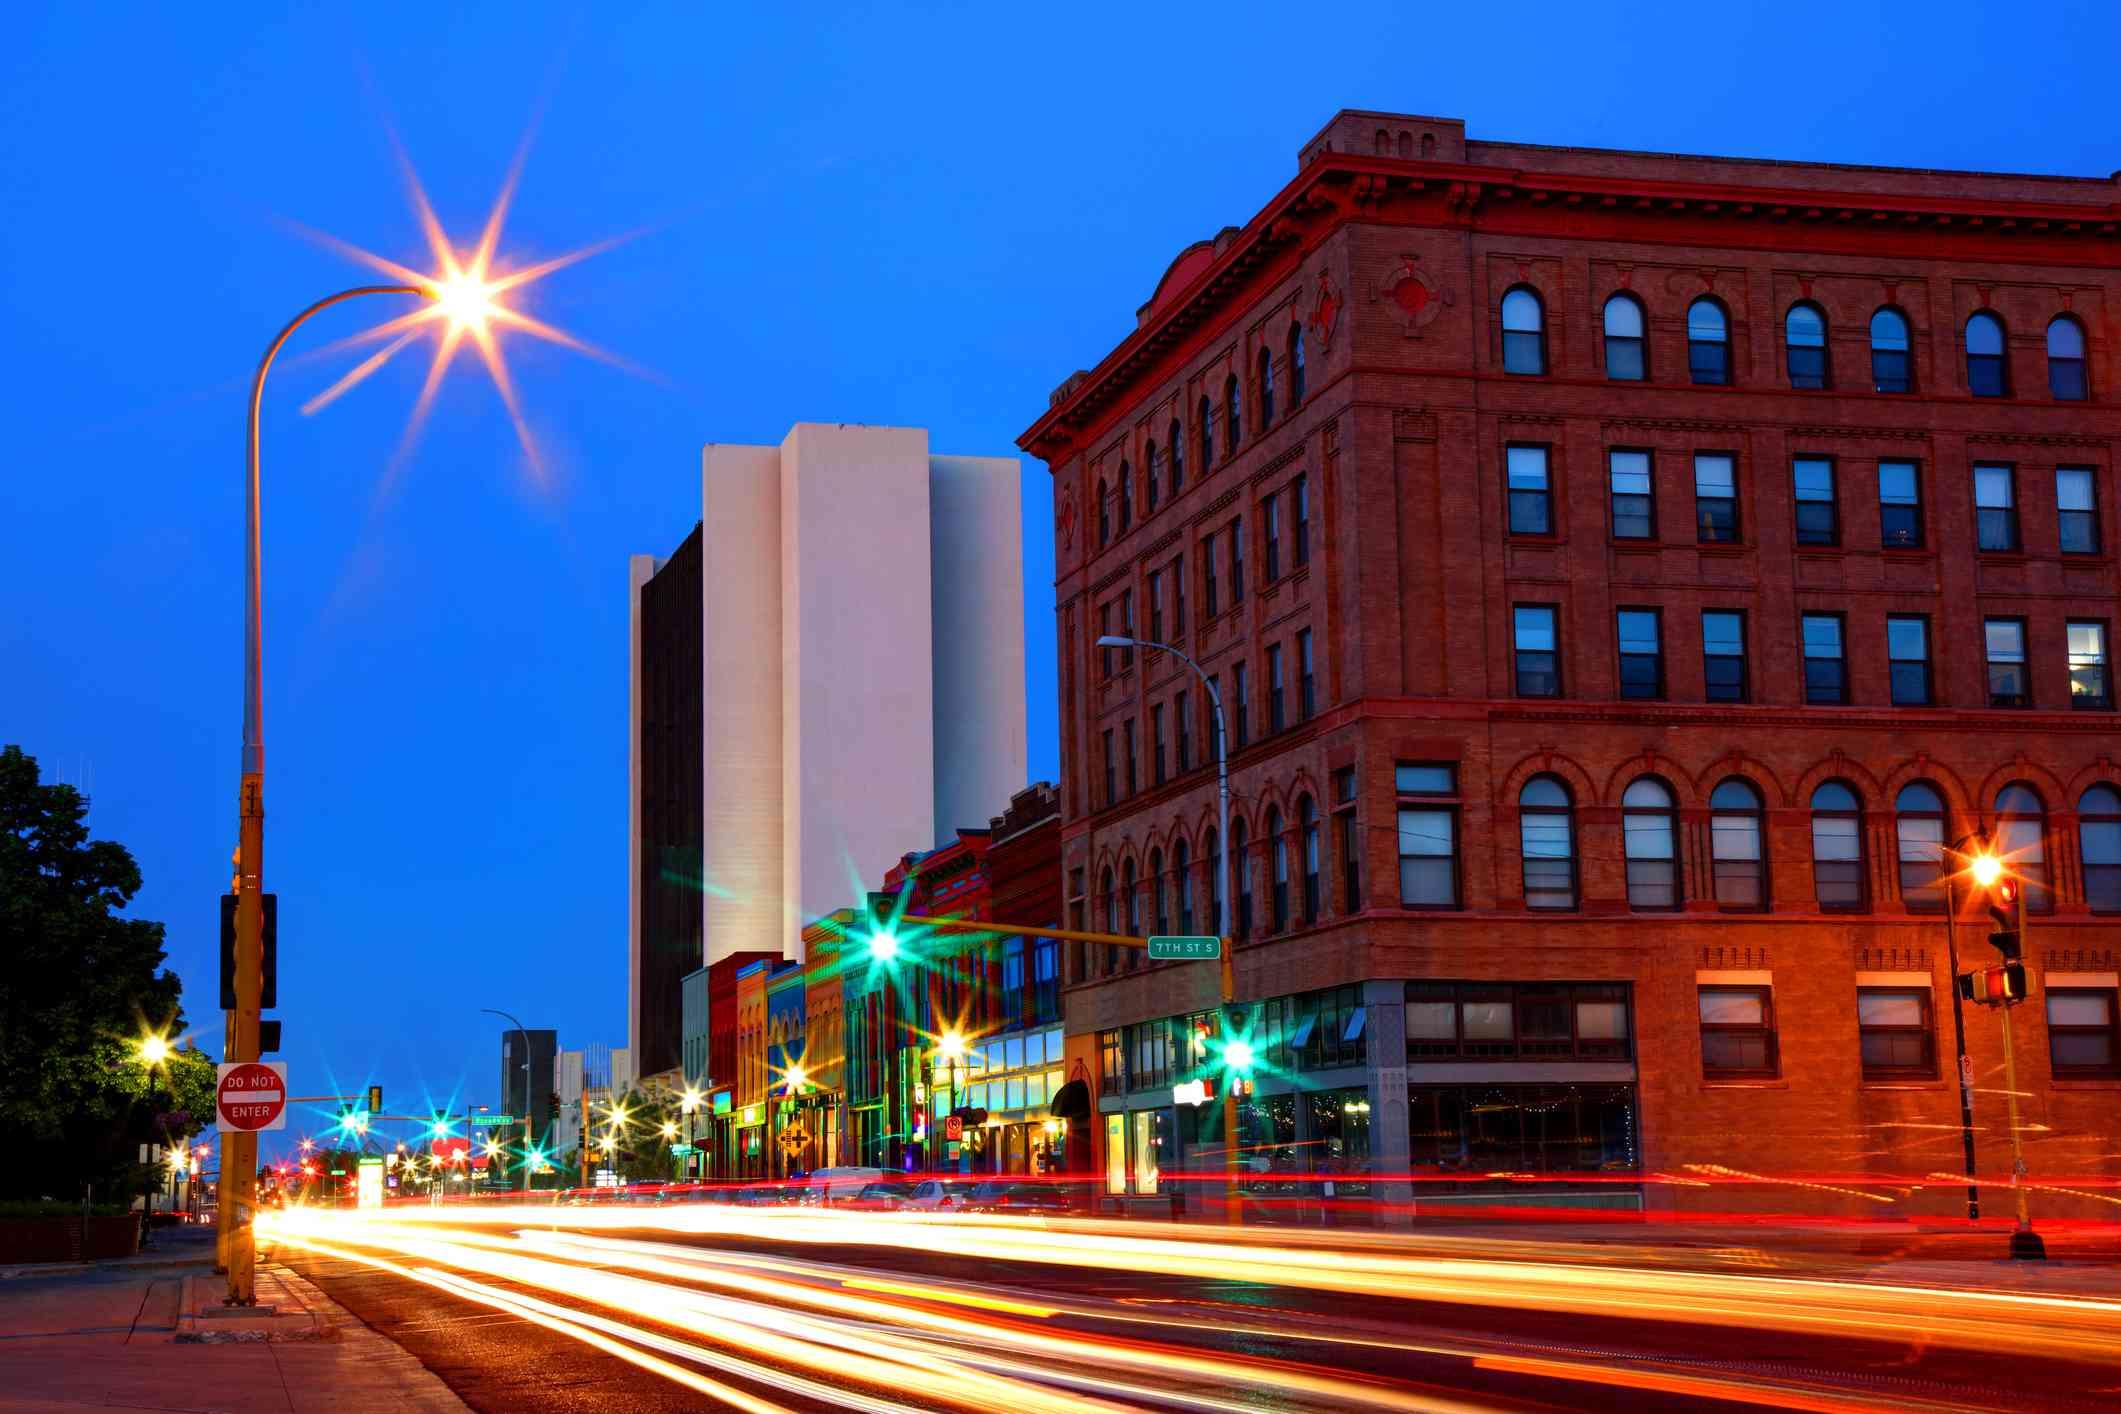 City of Fargo, North Dakota, at dusk